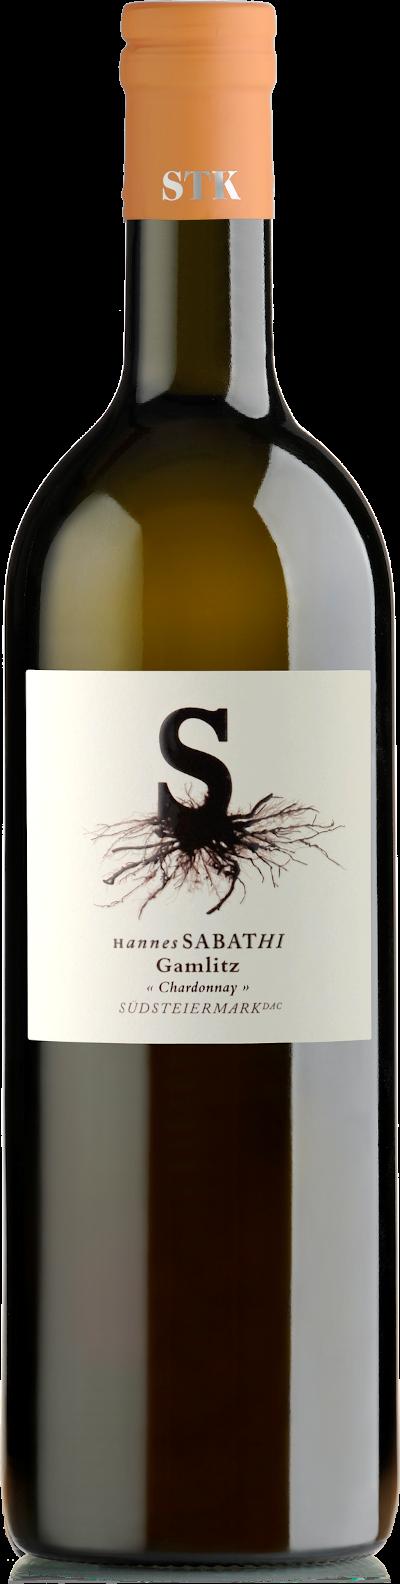 Sabathi Hannes - Chardonnay Gamlitz